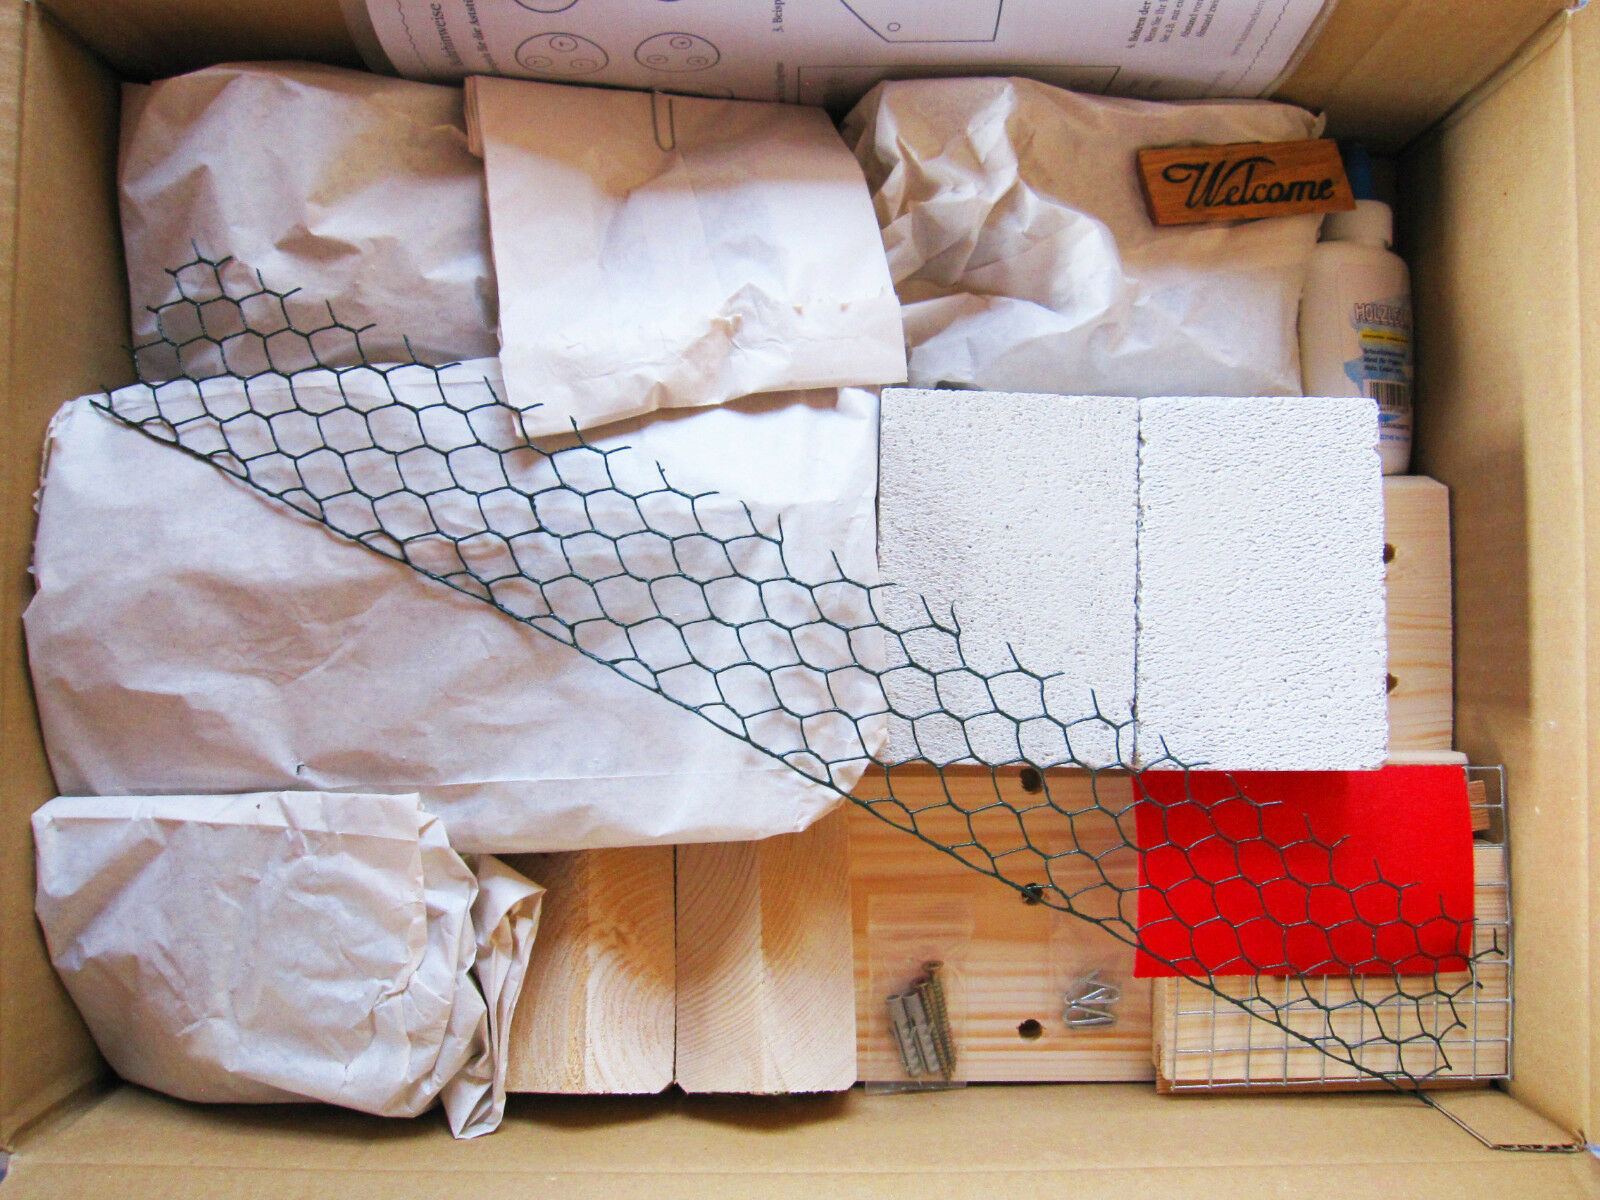 insektenhotel bausatz selber bauen landsitz insektenhaus. Black Bedroom Furniture Sets. Home Design Ideas